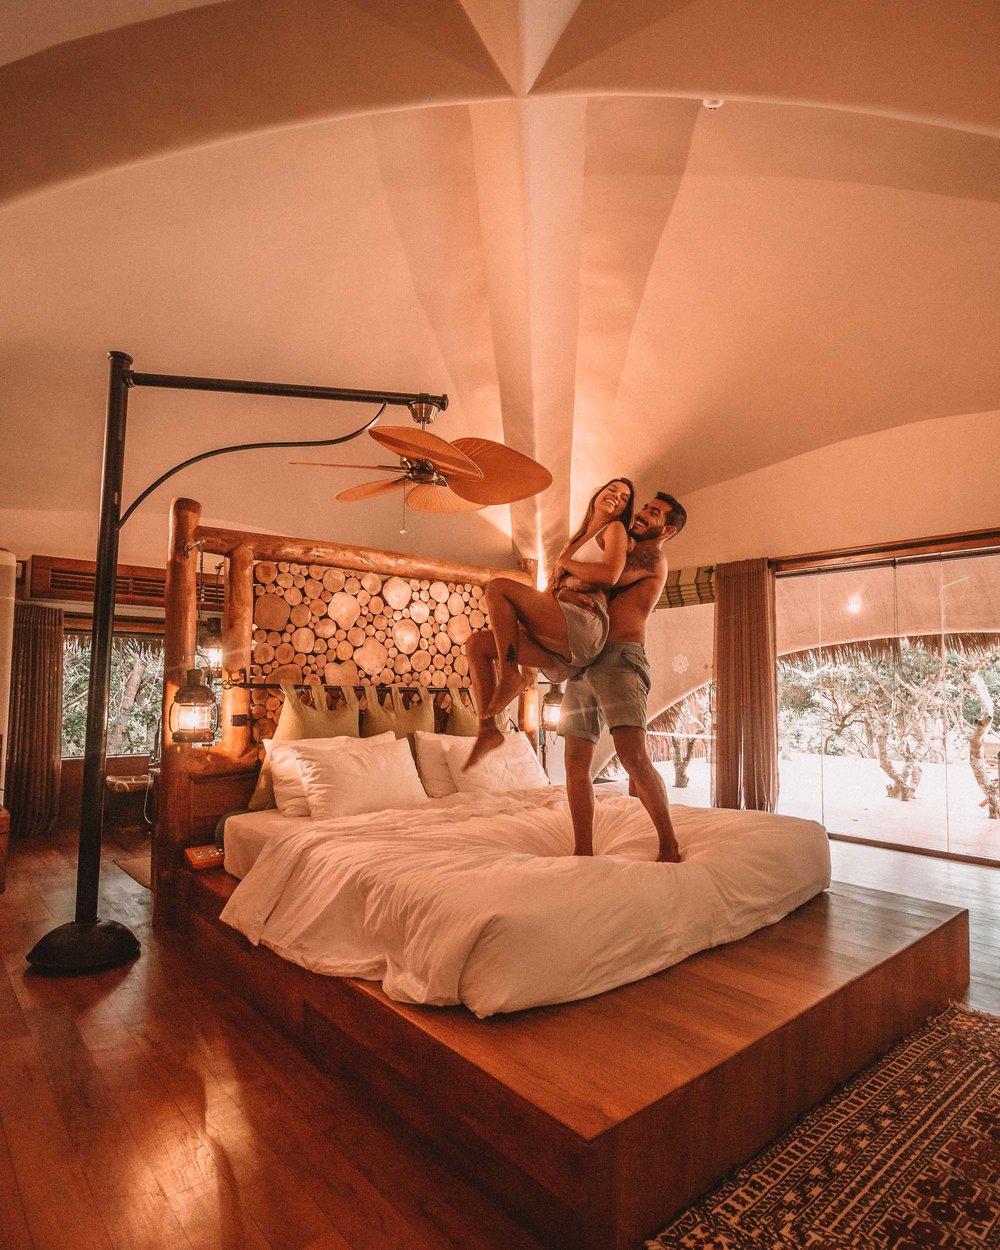 Yala national park Chena Huts uga escapes bedroom couple time honeymoon best safari camp for travelers